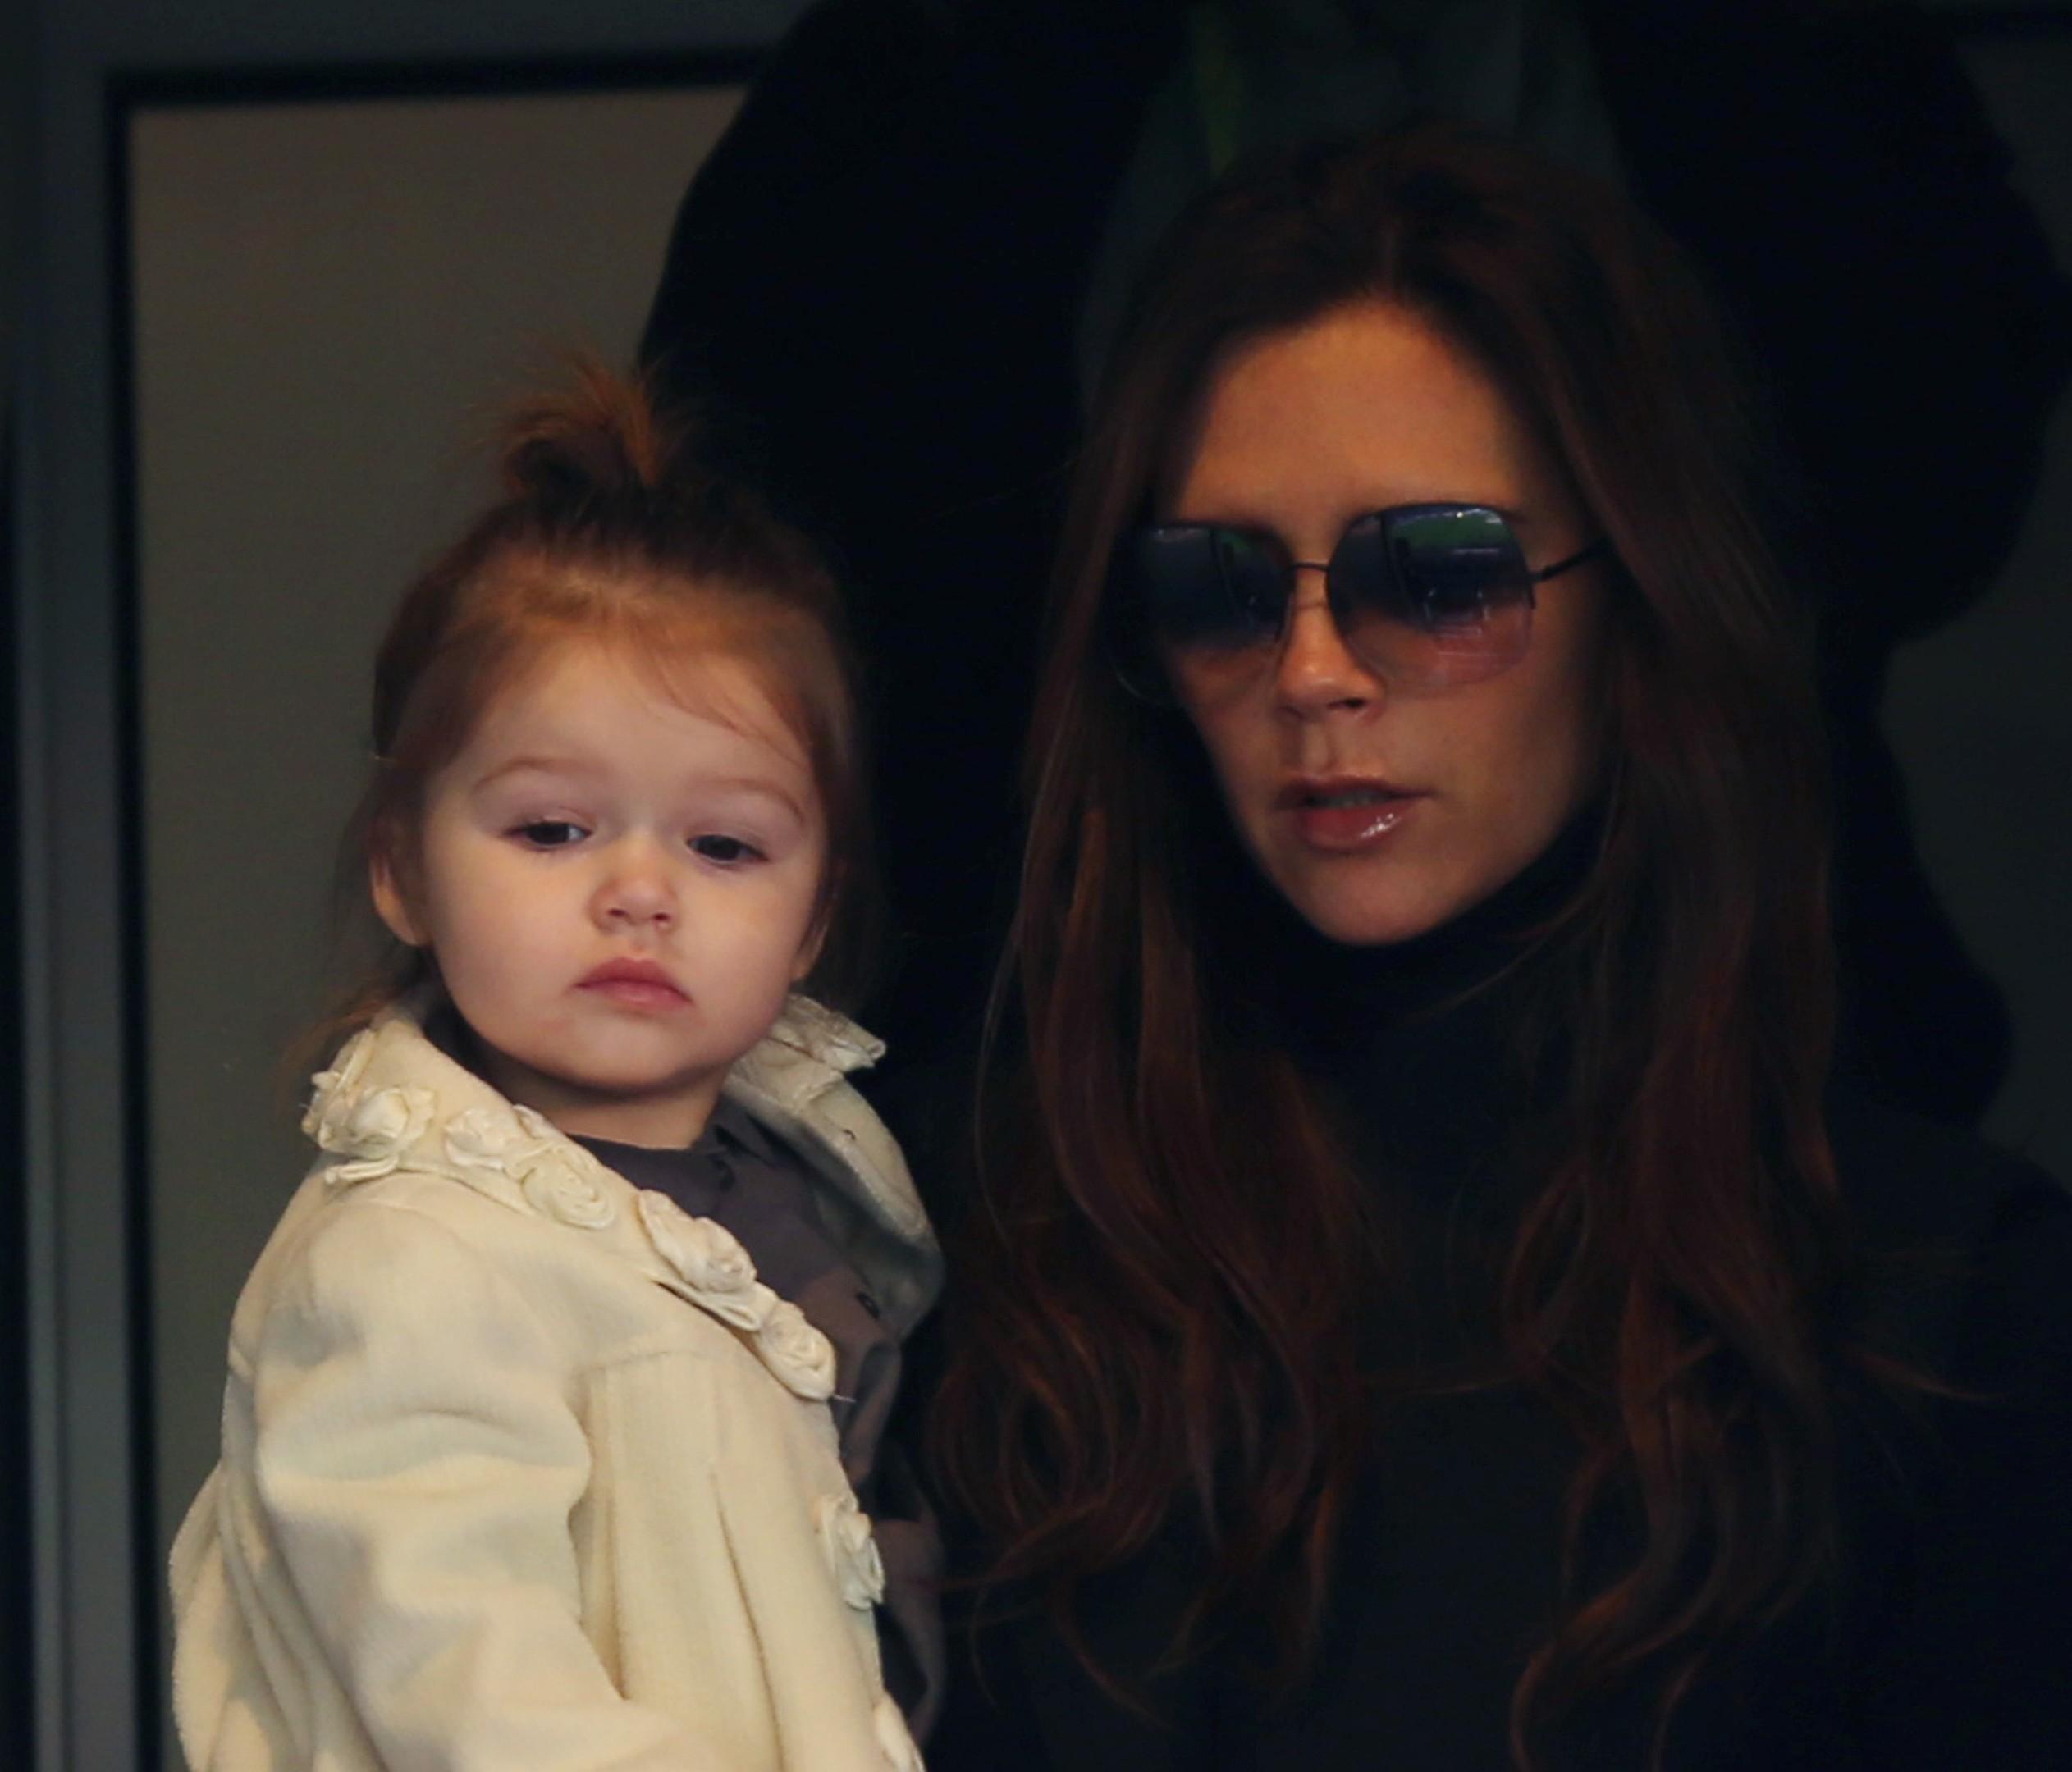 Victoria Beckham holding her daughter Harper